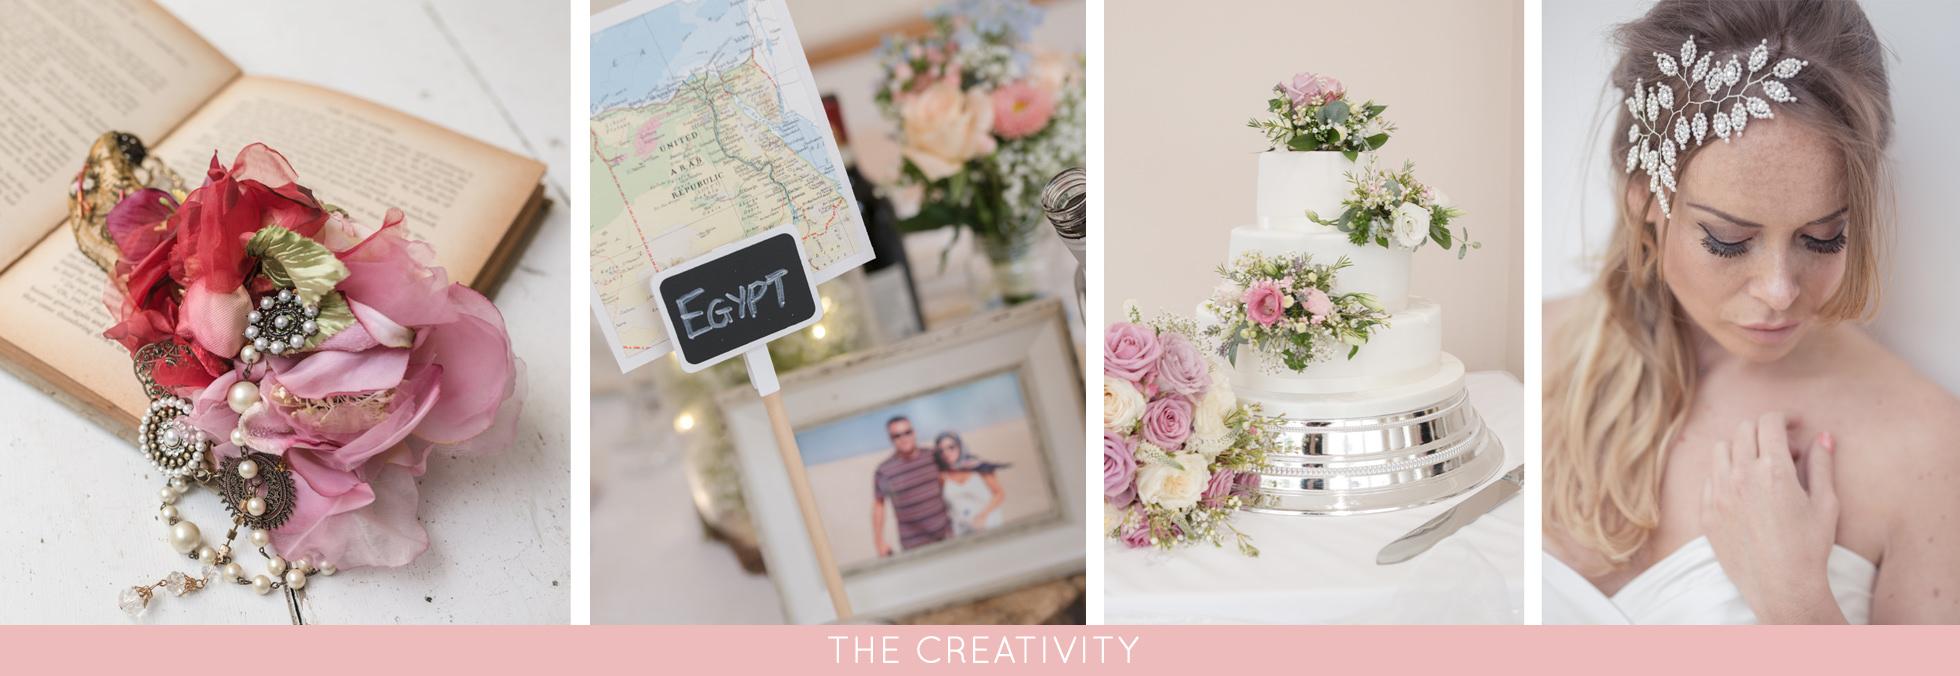 creative wedding decor and details